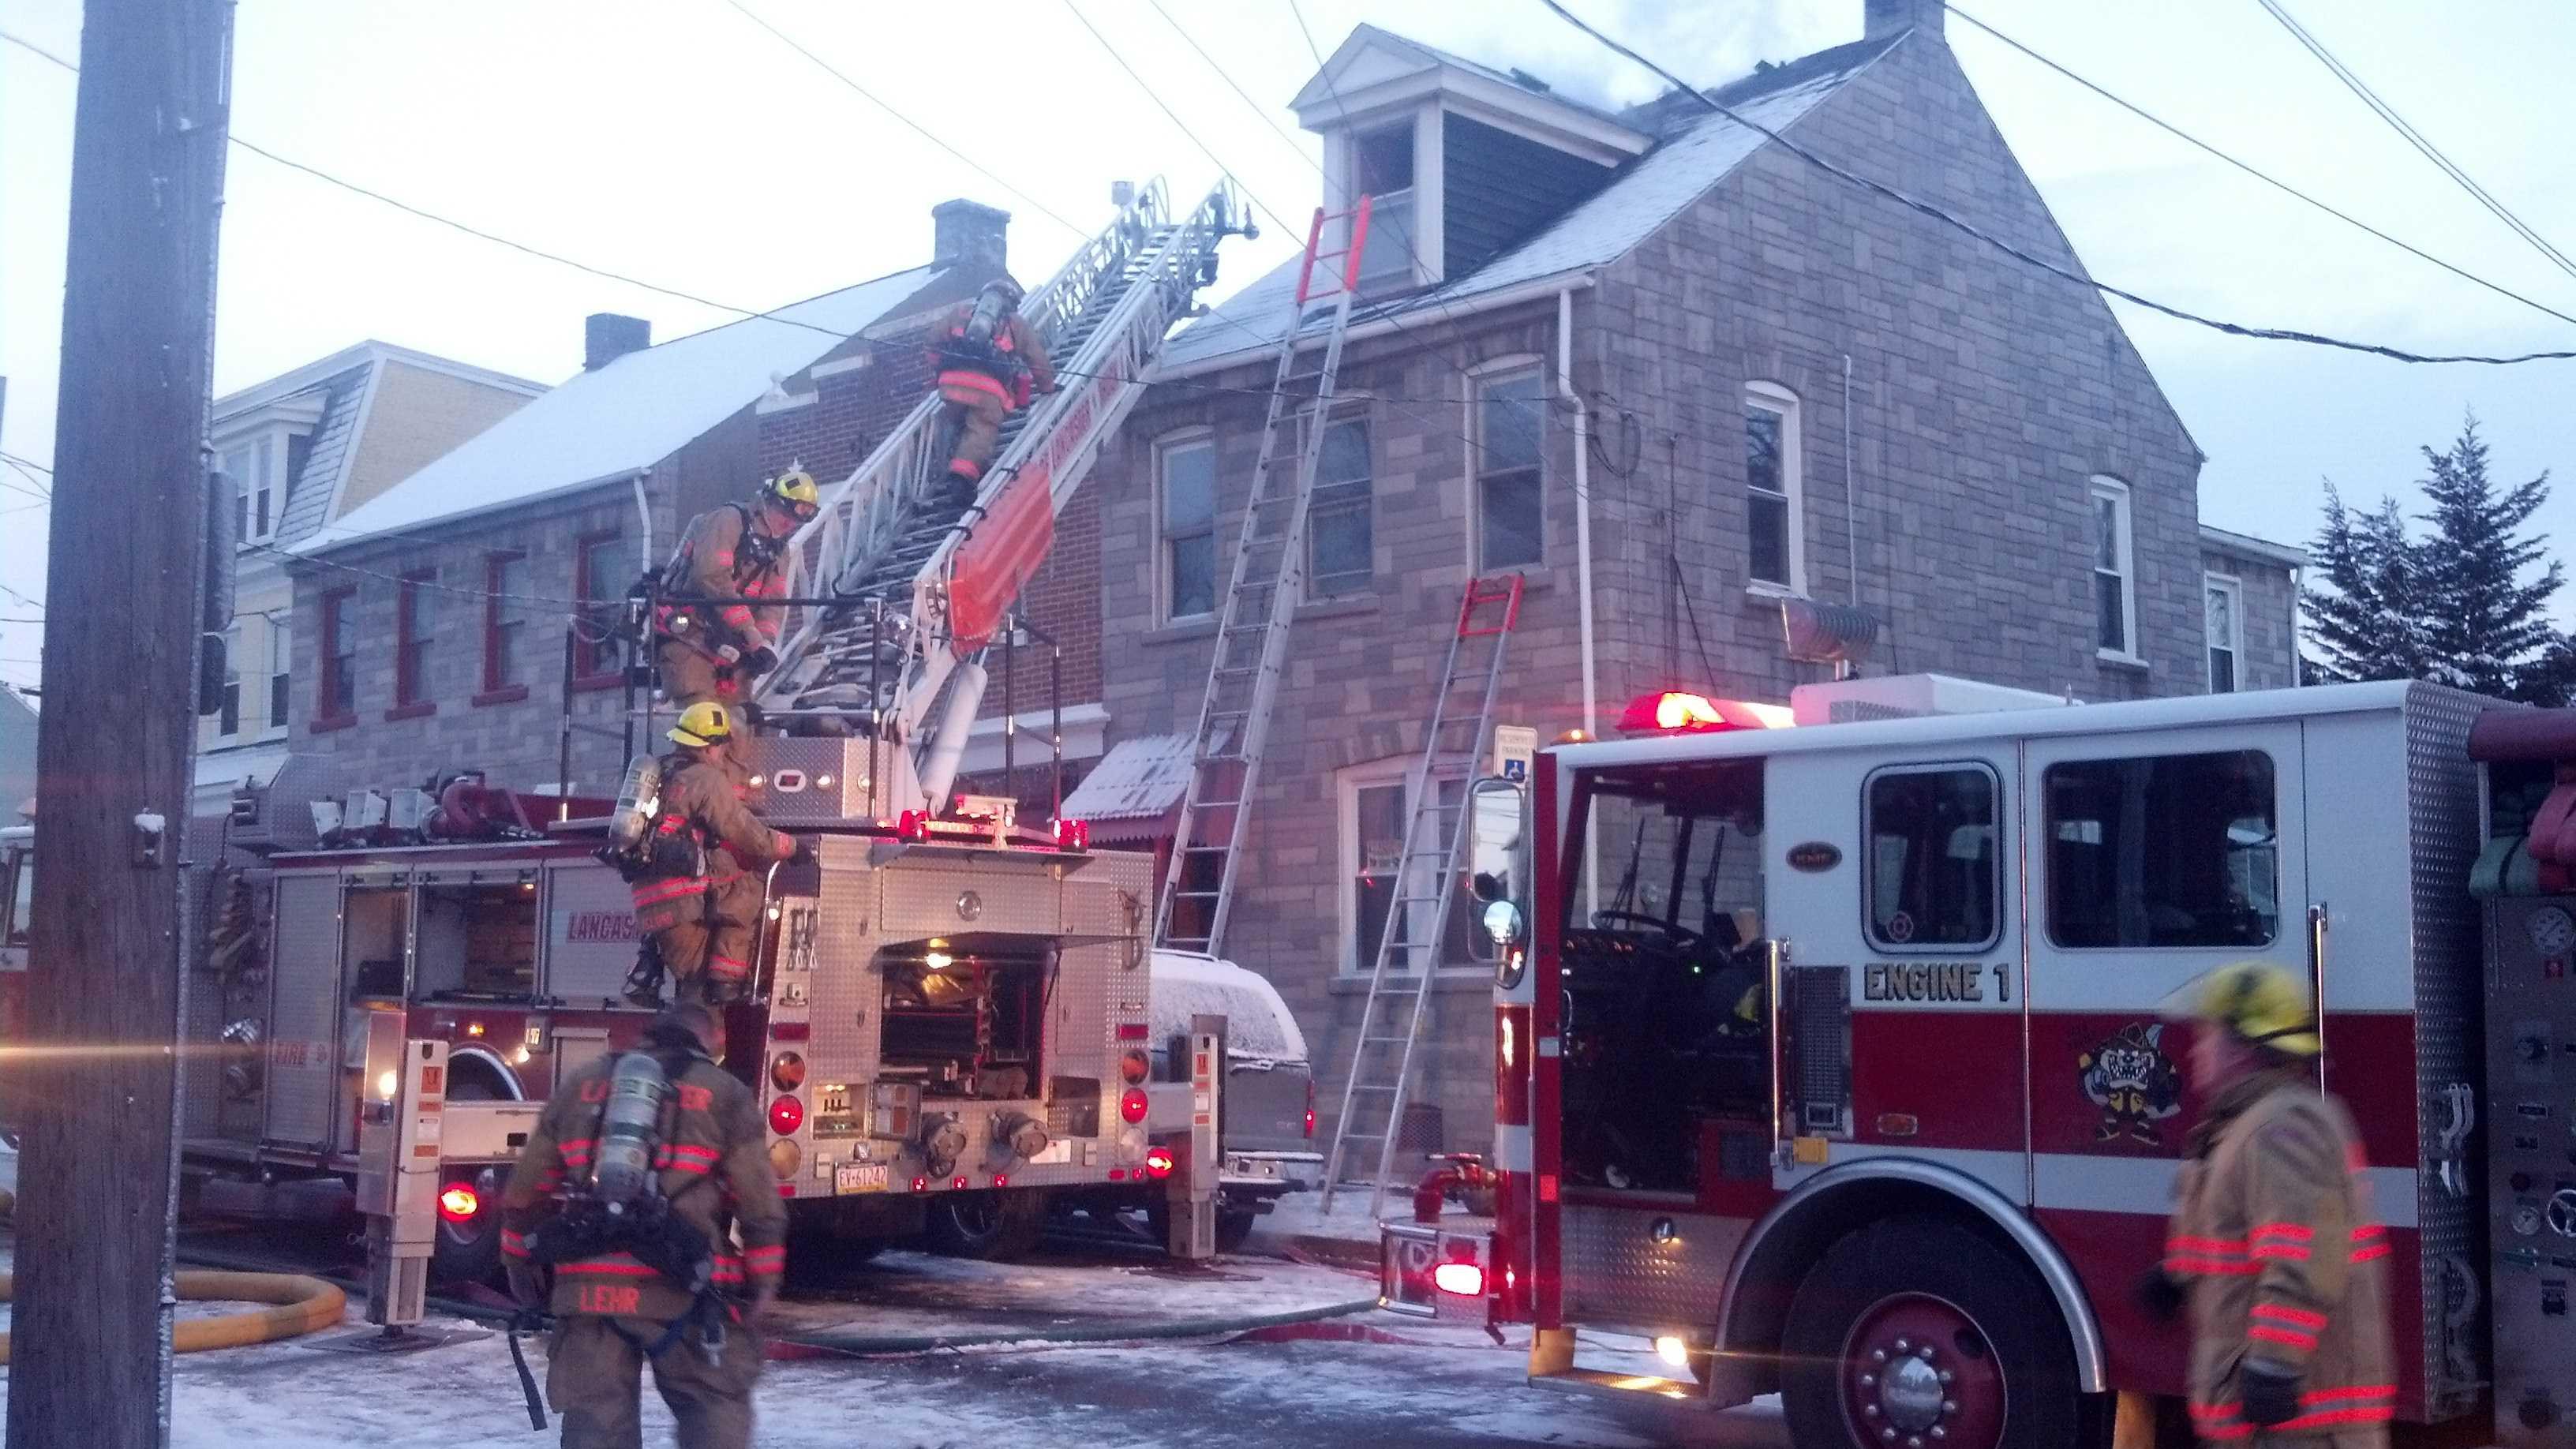 3.26.14 manor street fire photo